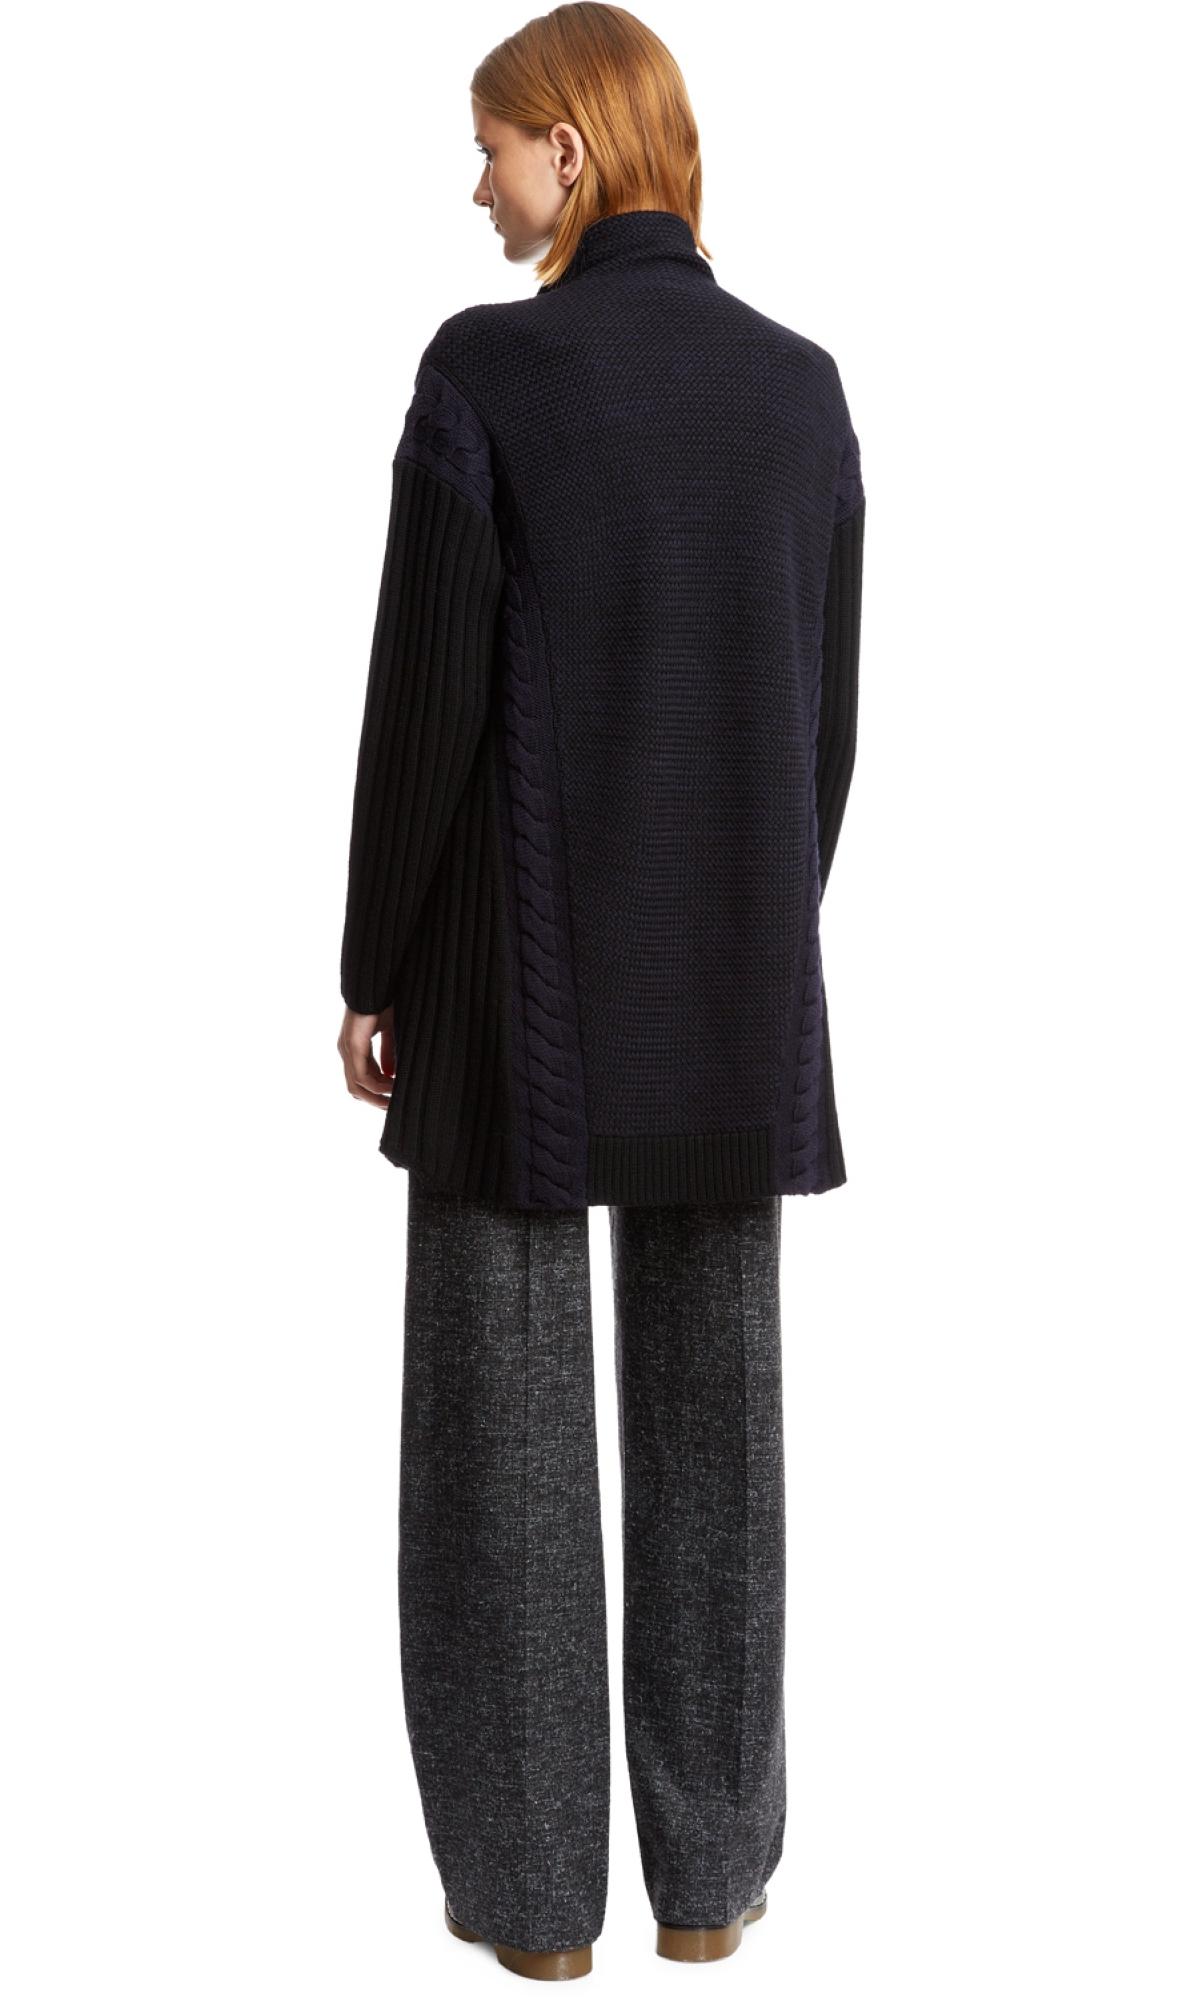 Nicole farhi Basket Weave Cardigan in Black   Lyst